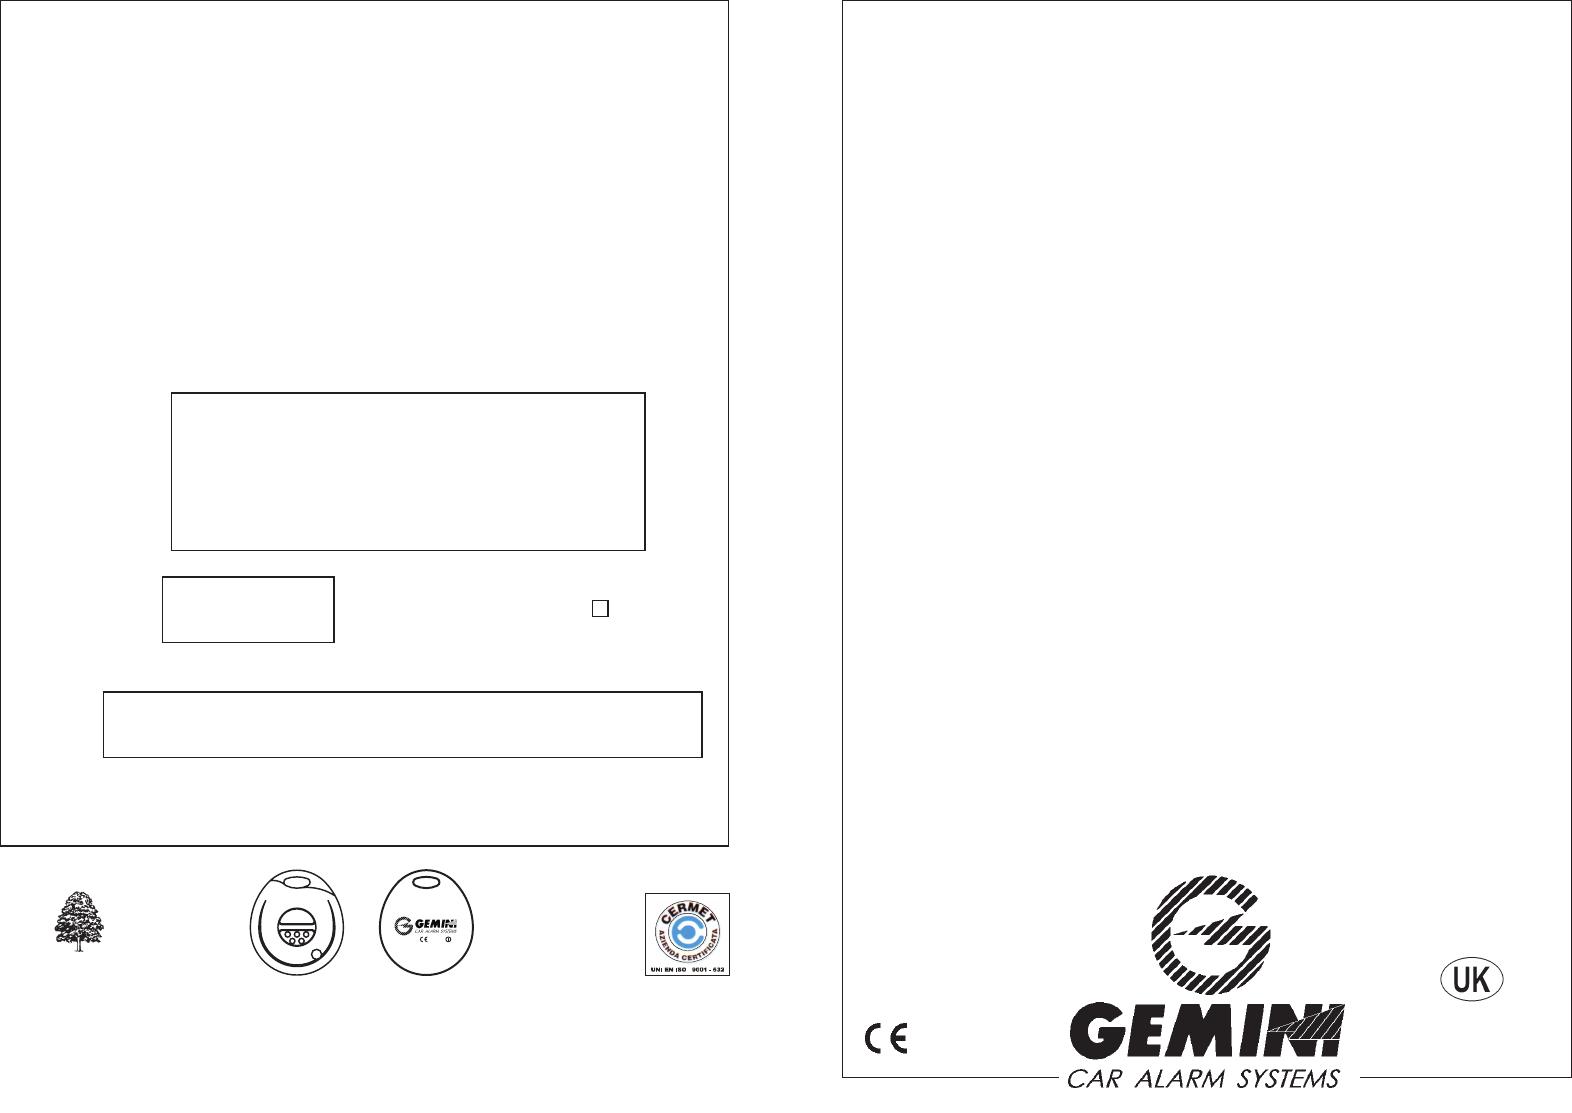 Gemini 7090